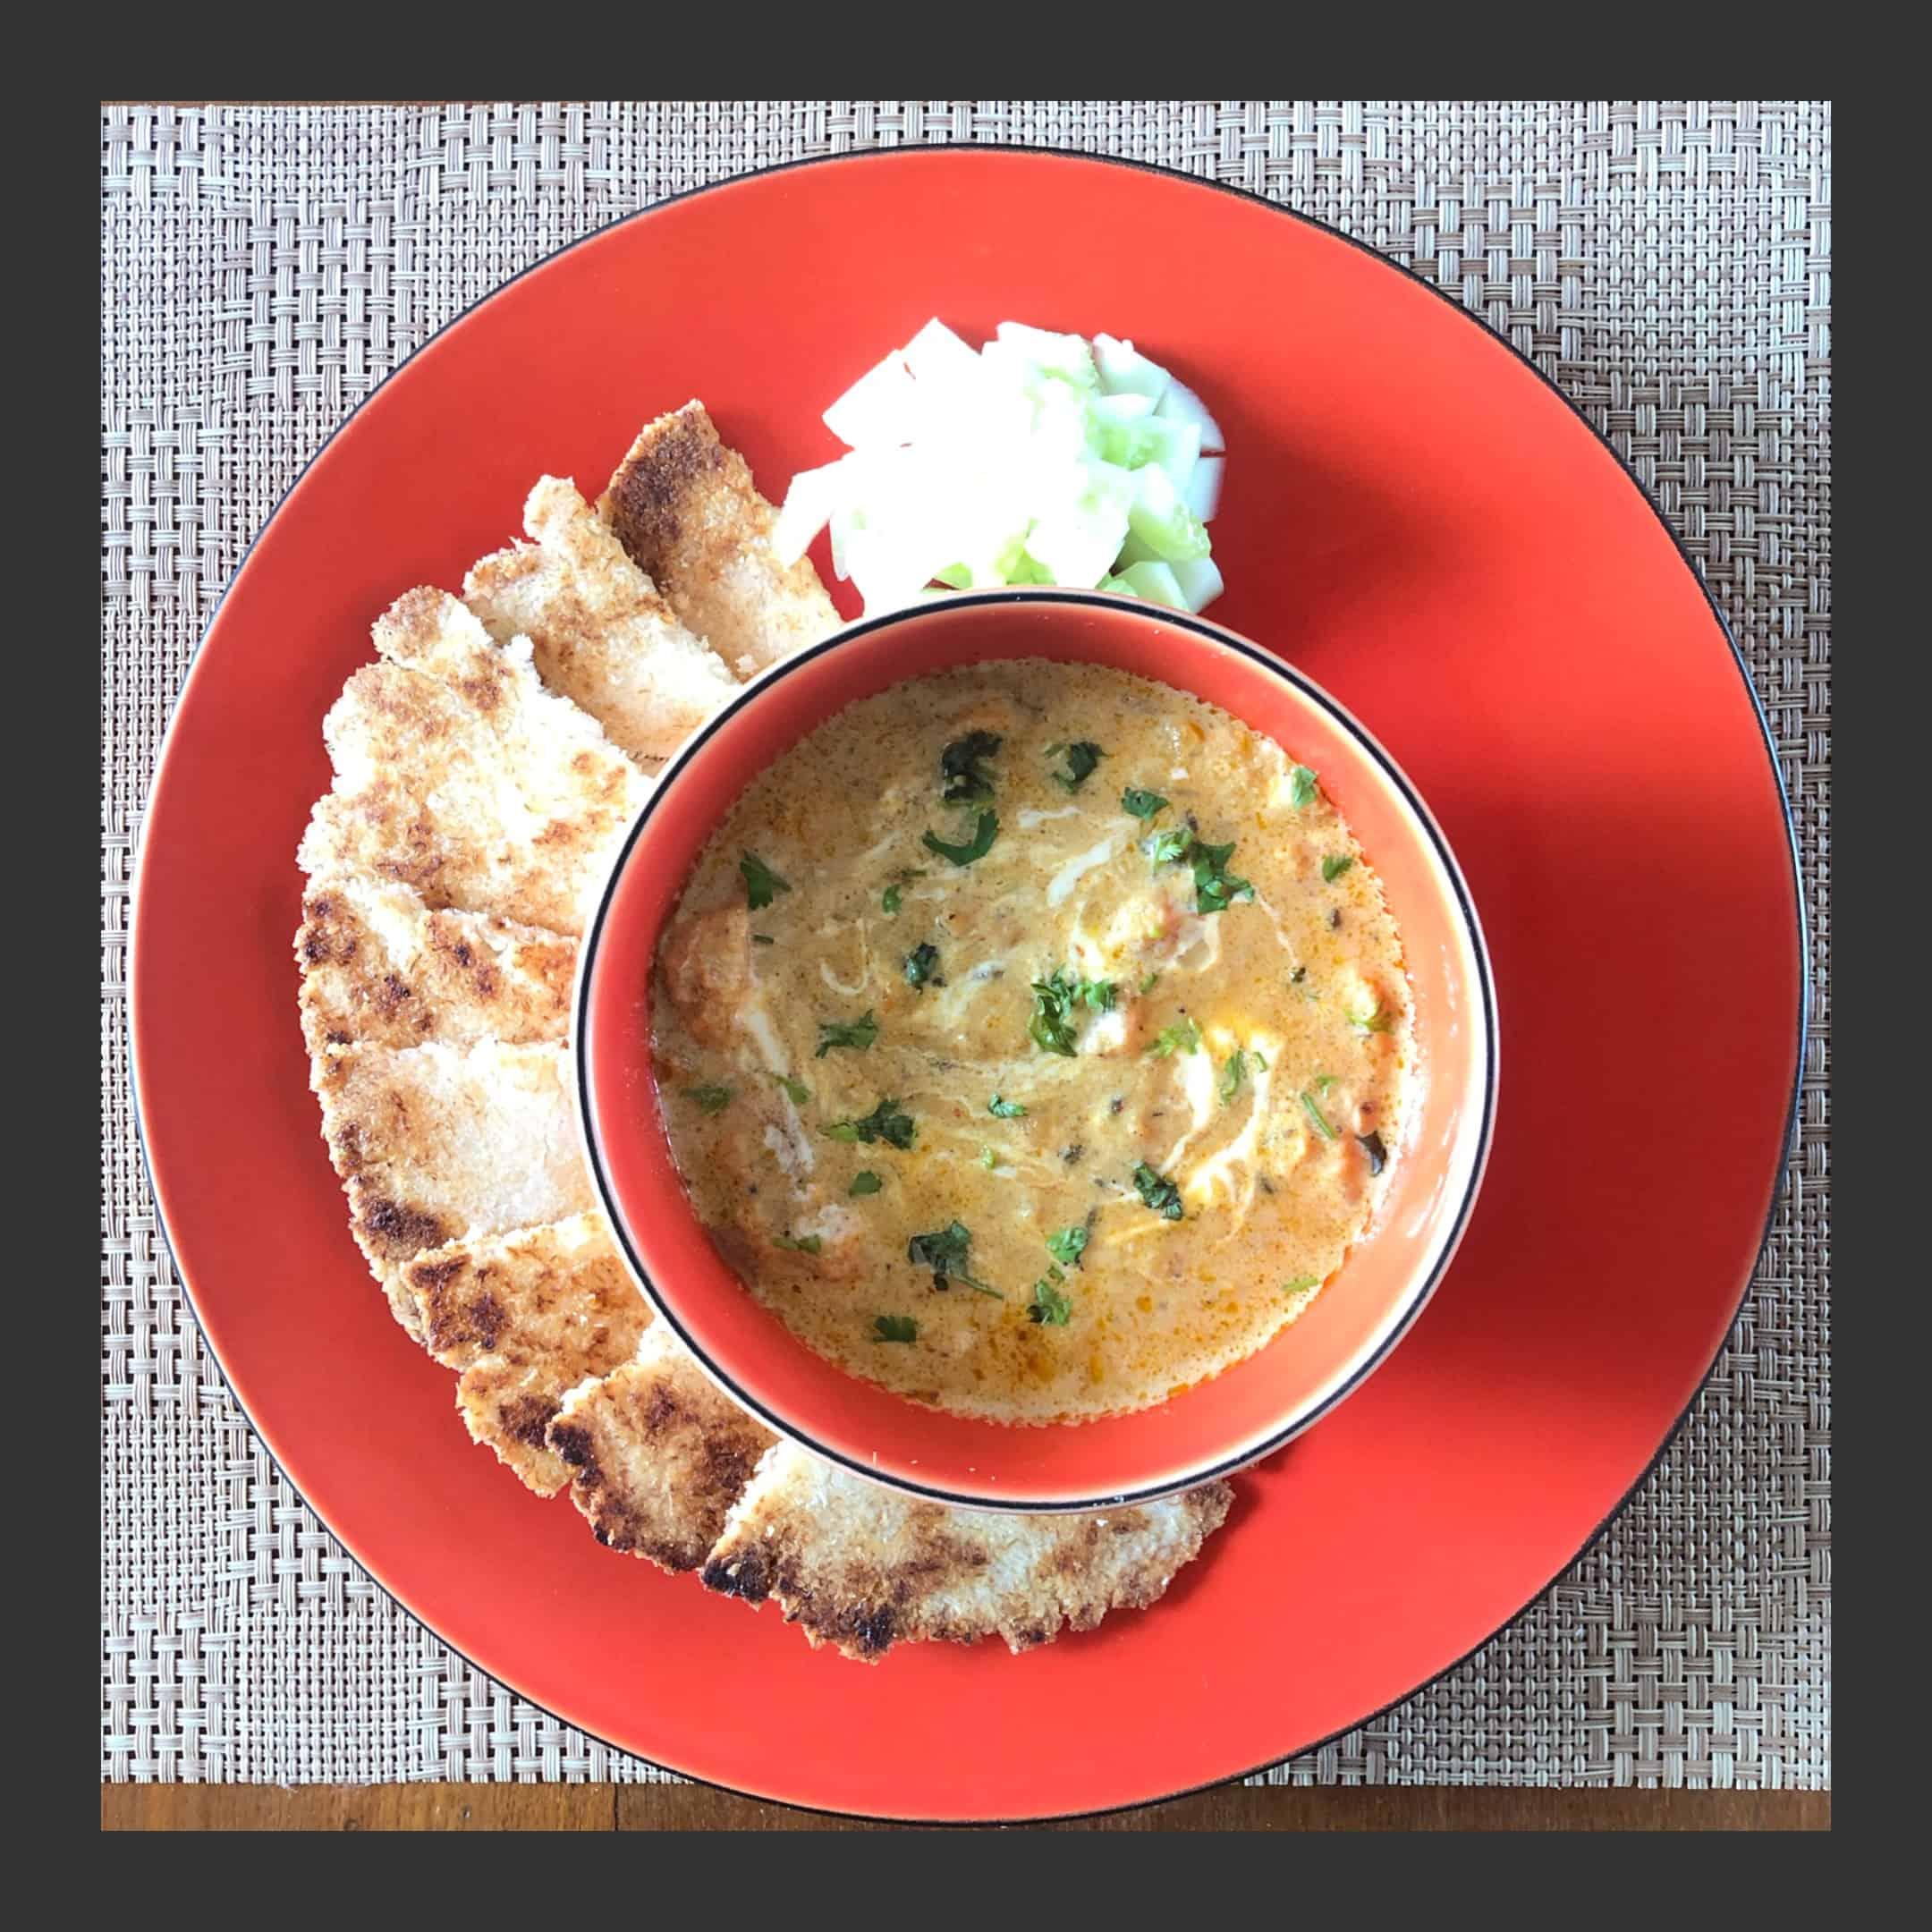 Keto Recipes, Ketorets by Rahul Kamra